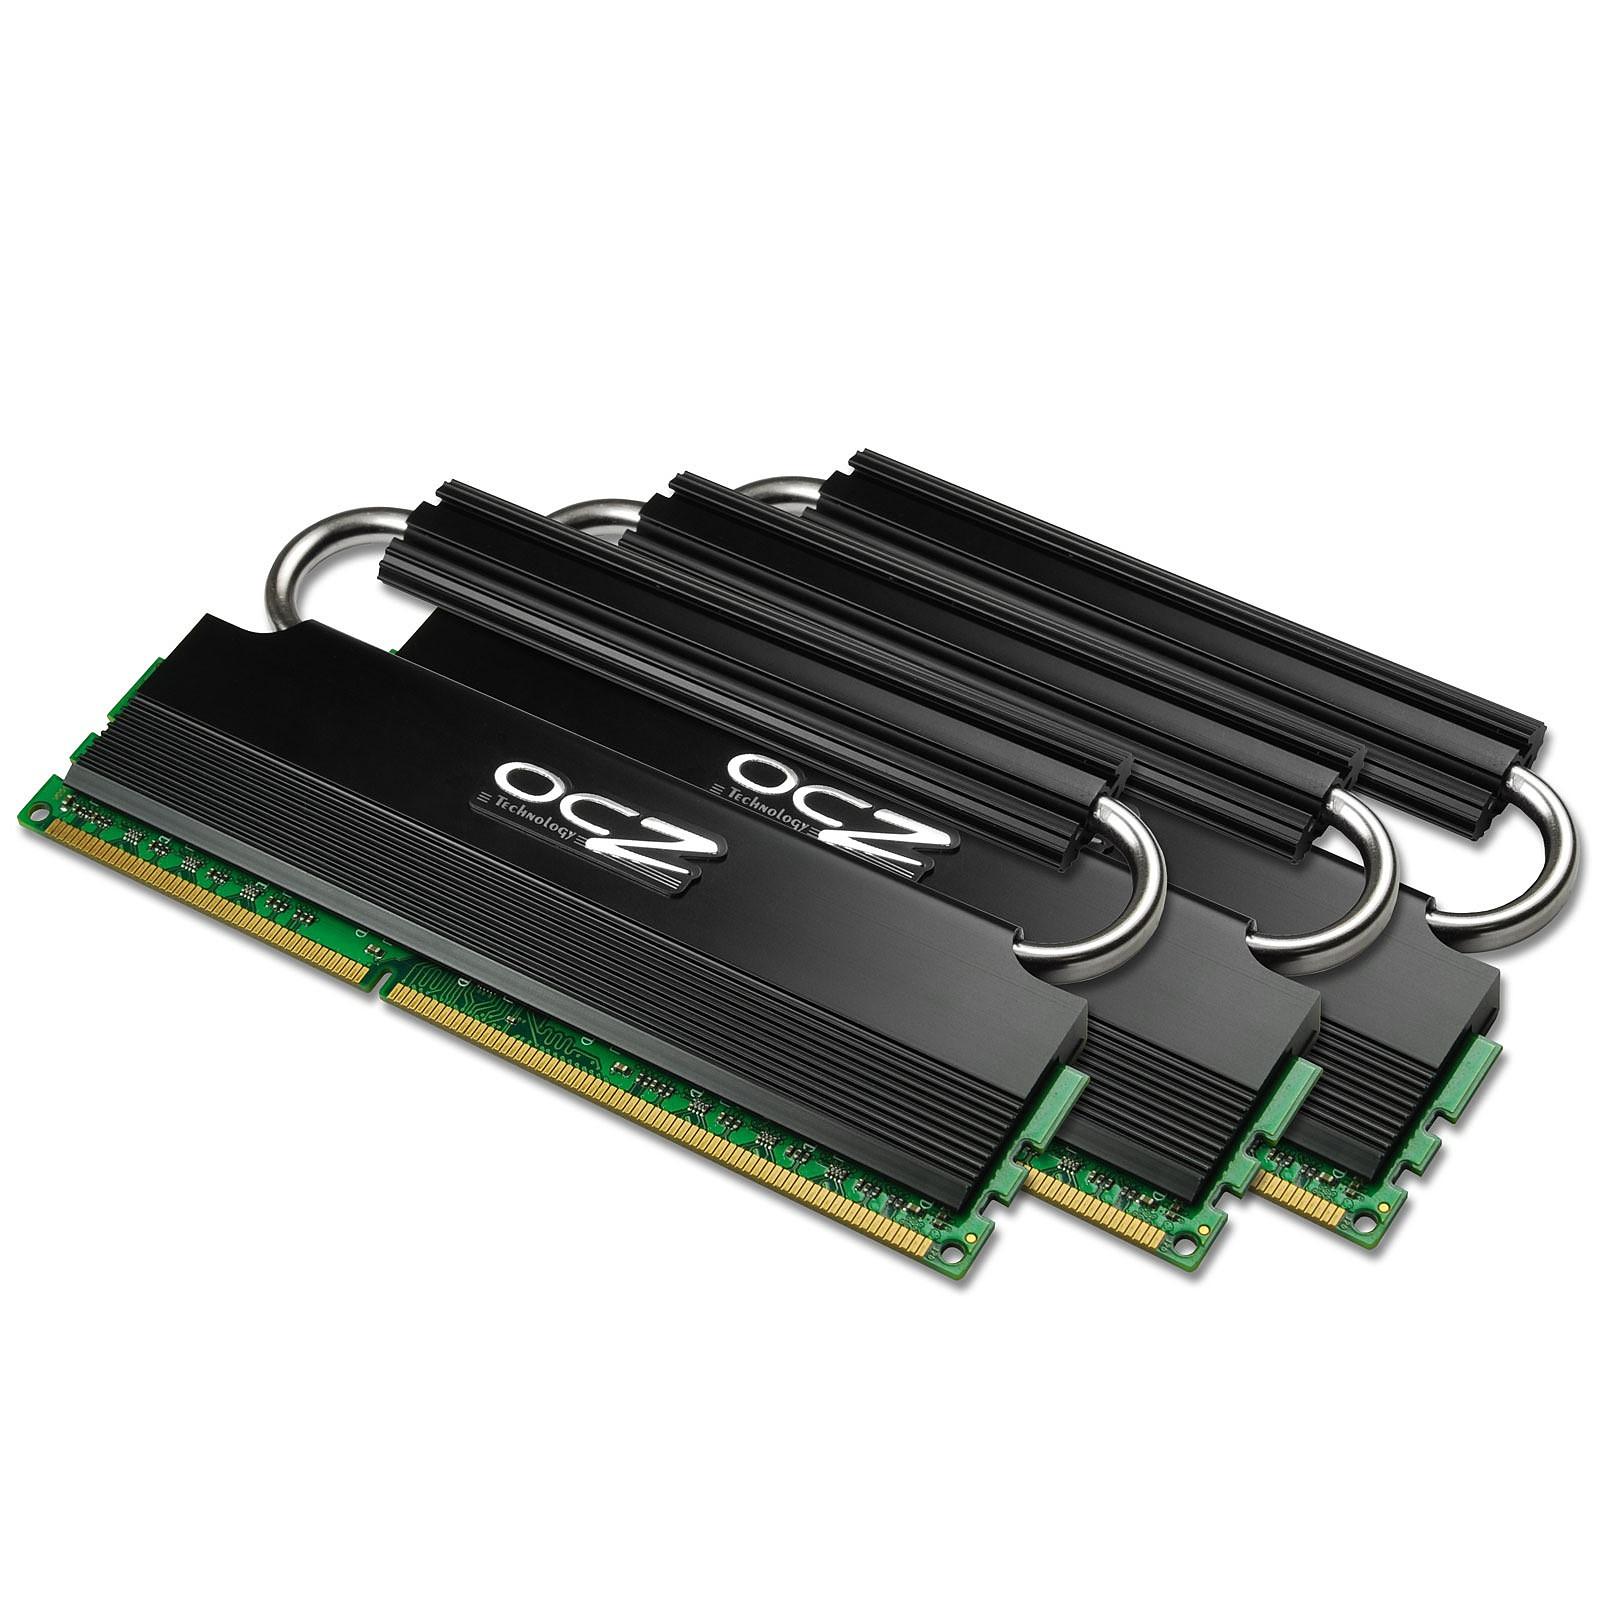 OCZ Reaper HPC 12 Go (3x 4Go) DDR3 2000 MHz